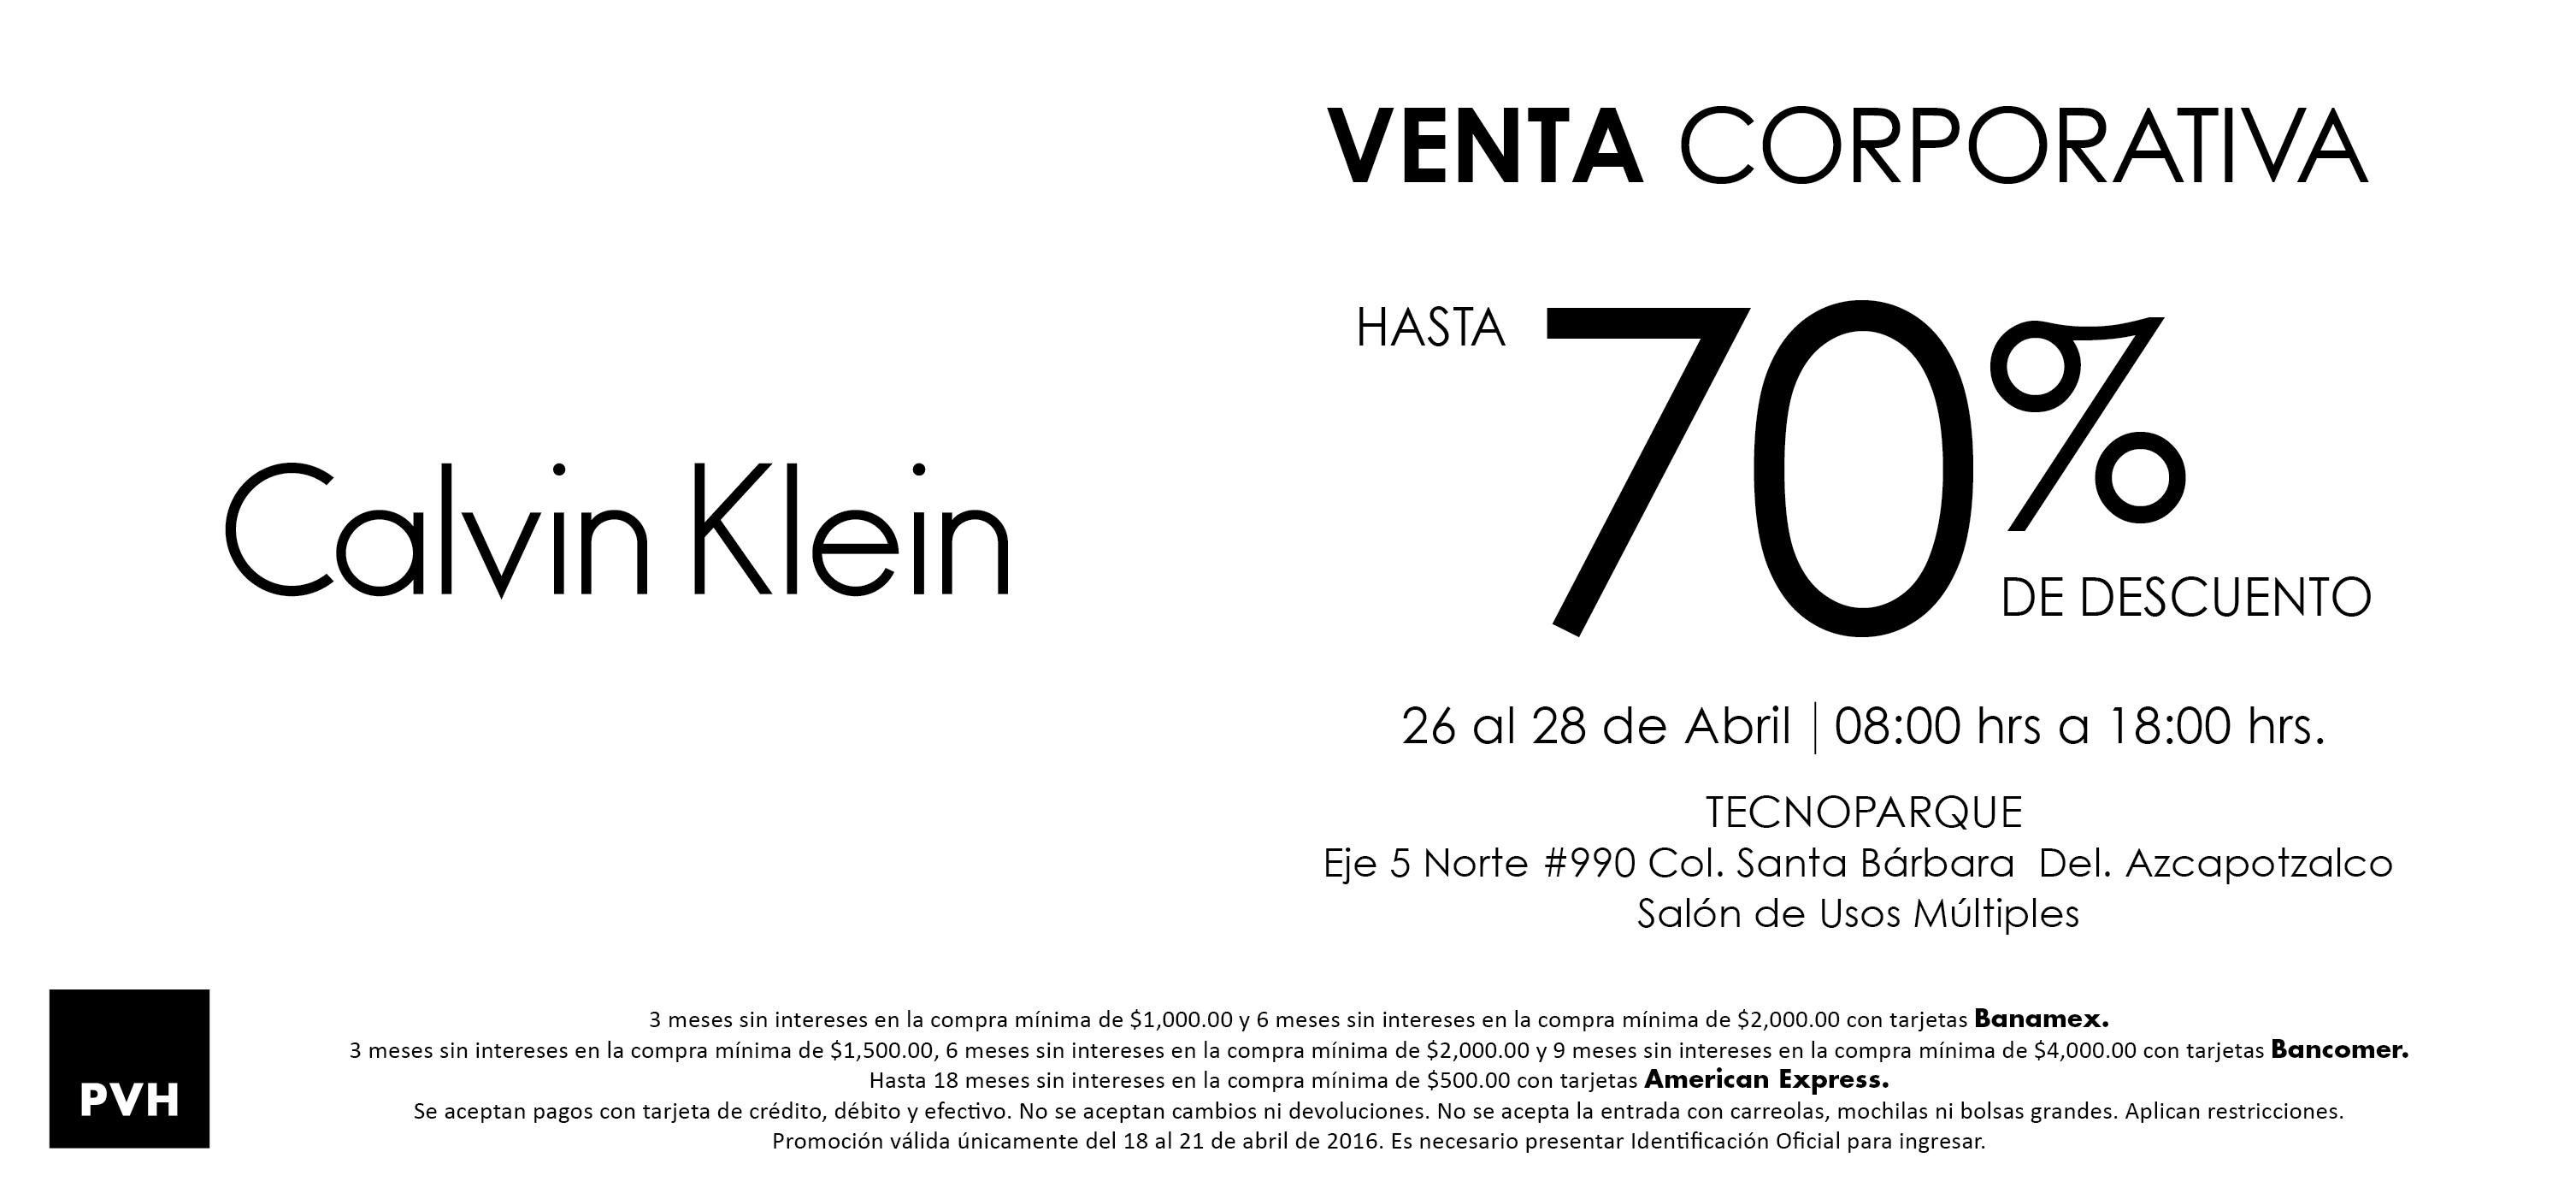 Venta corporativa Calvin Klein se extiende del 26 al 28 de abril